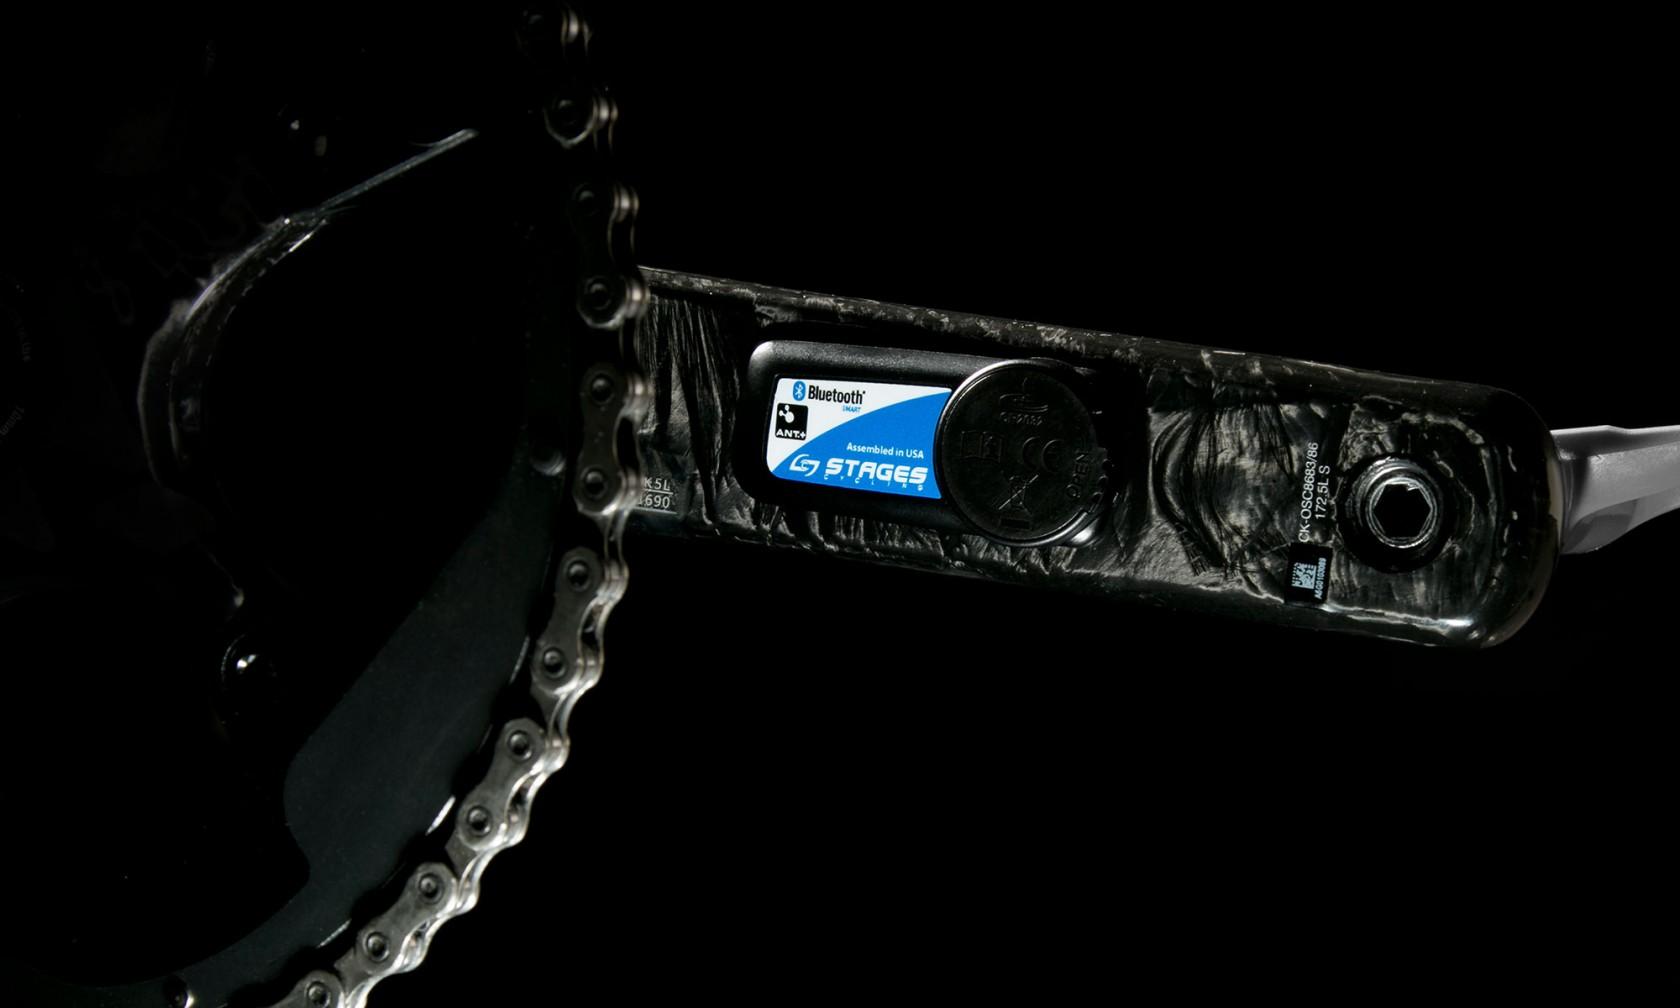 crank-pedal-1680x1008.jpg